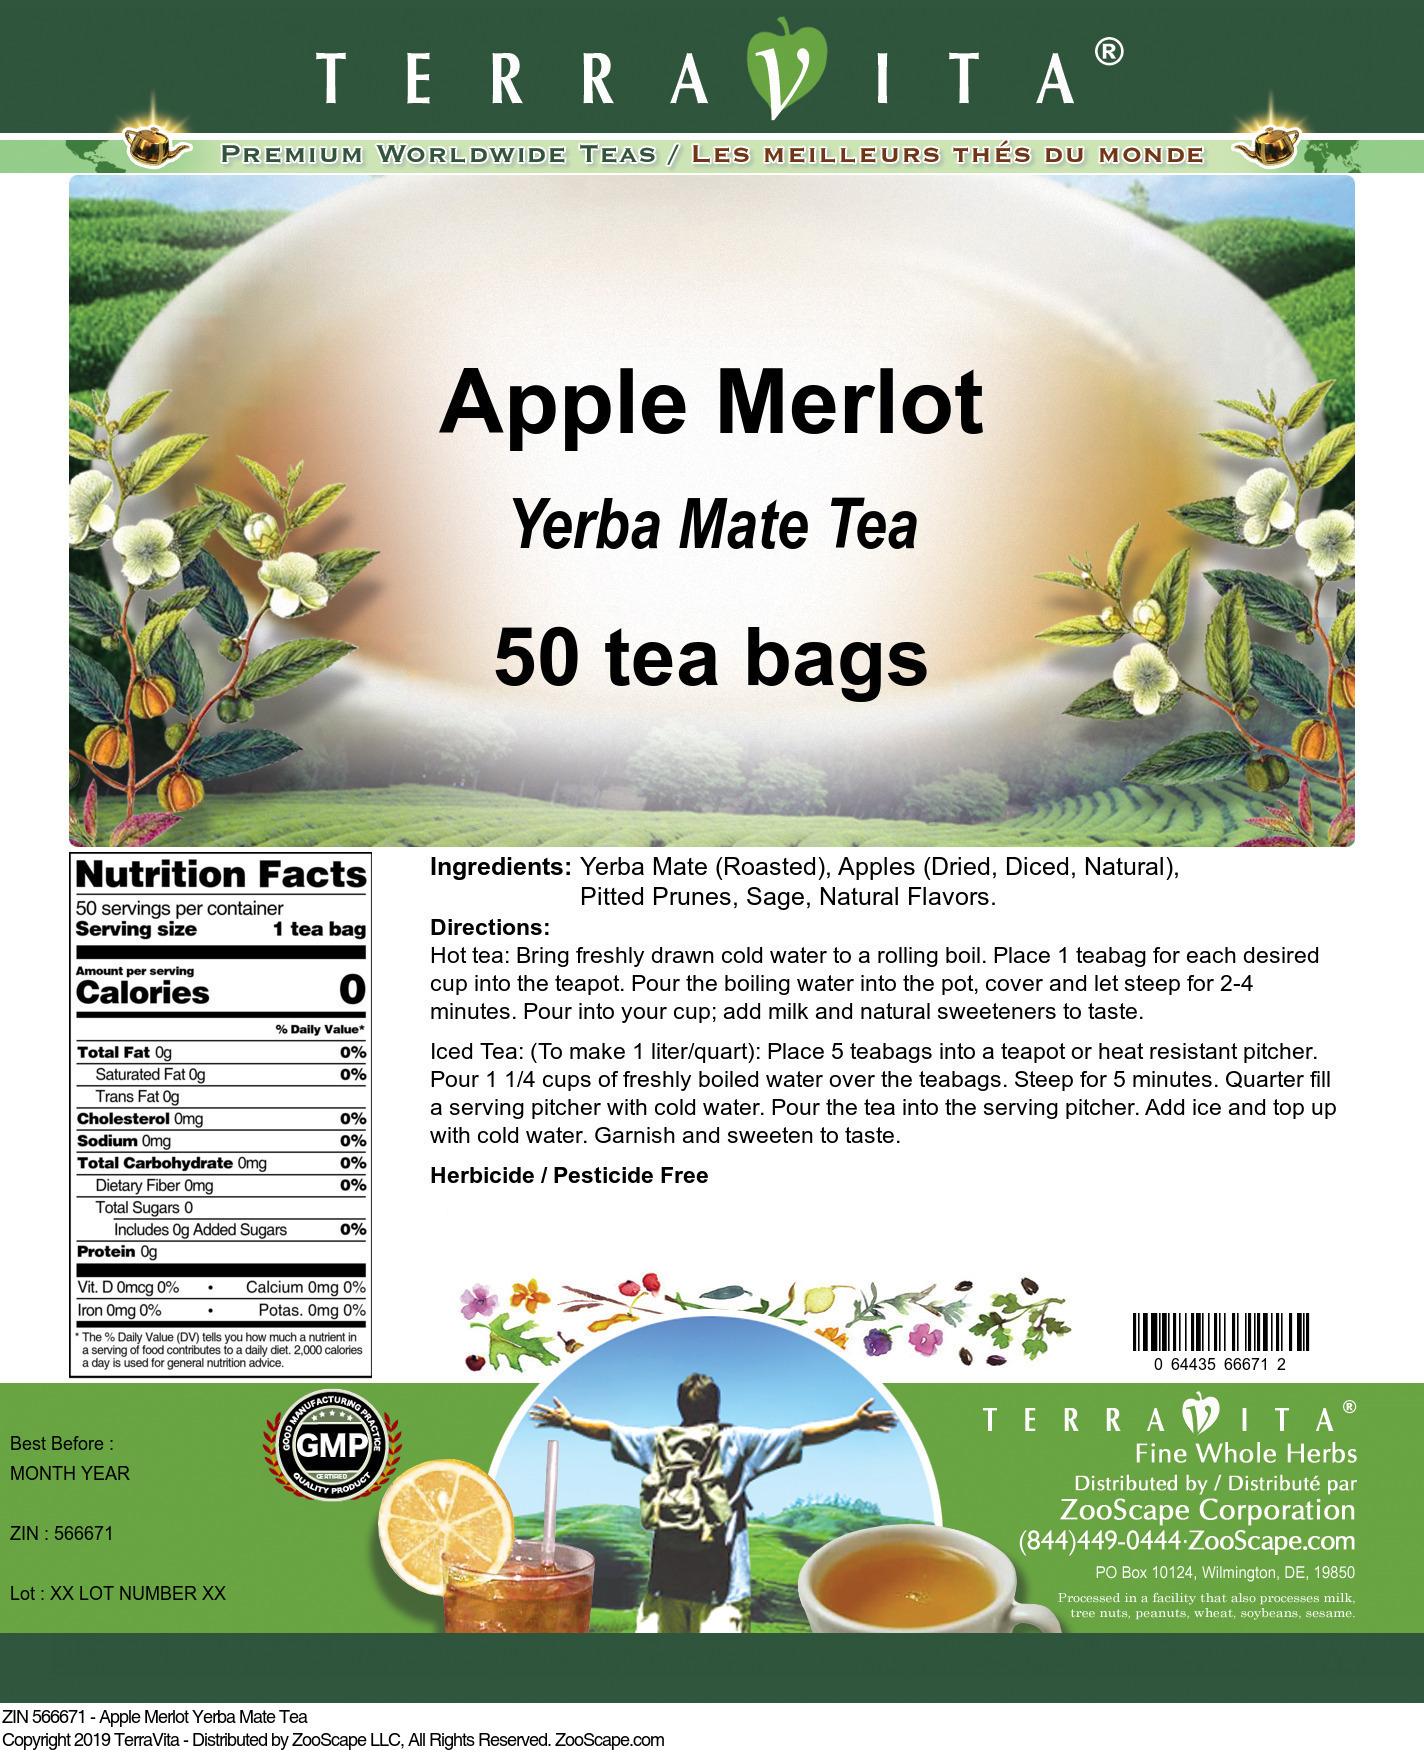 Apple Merlot Yerba Mate